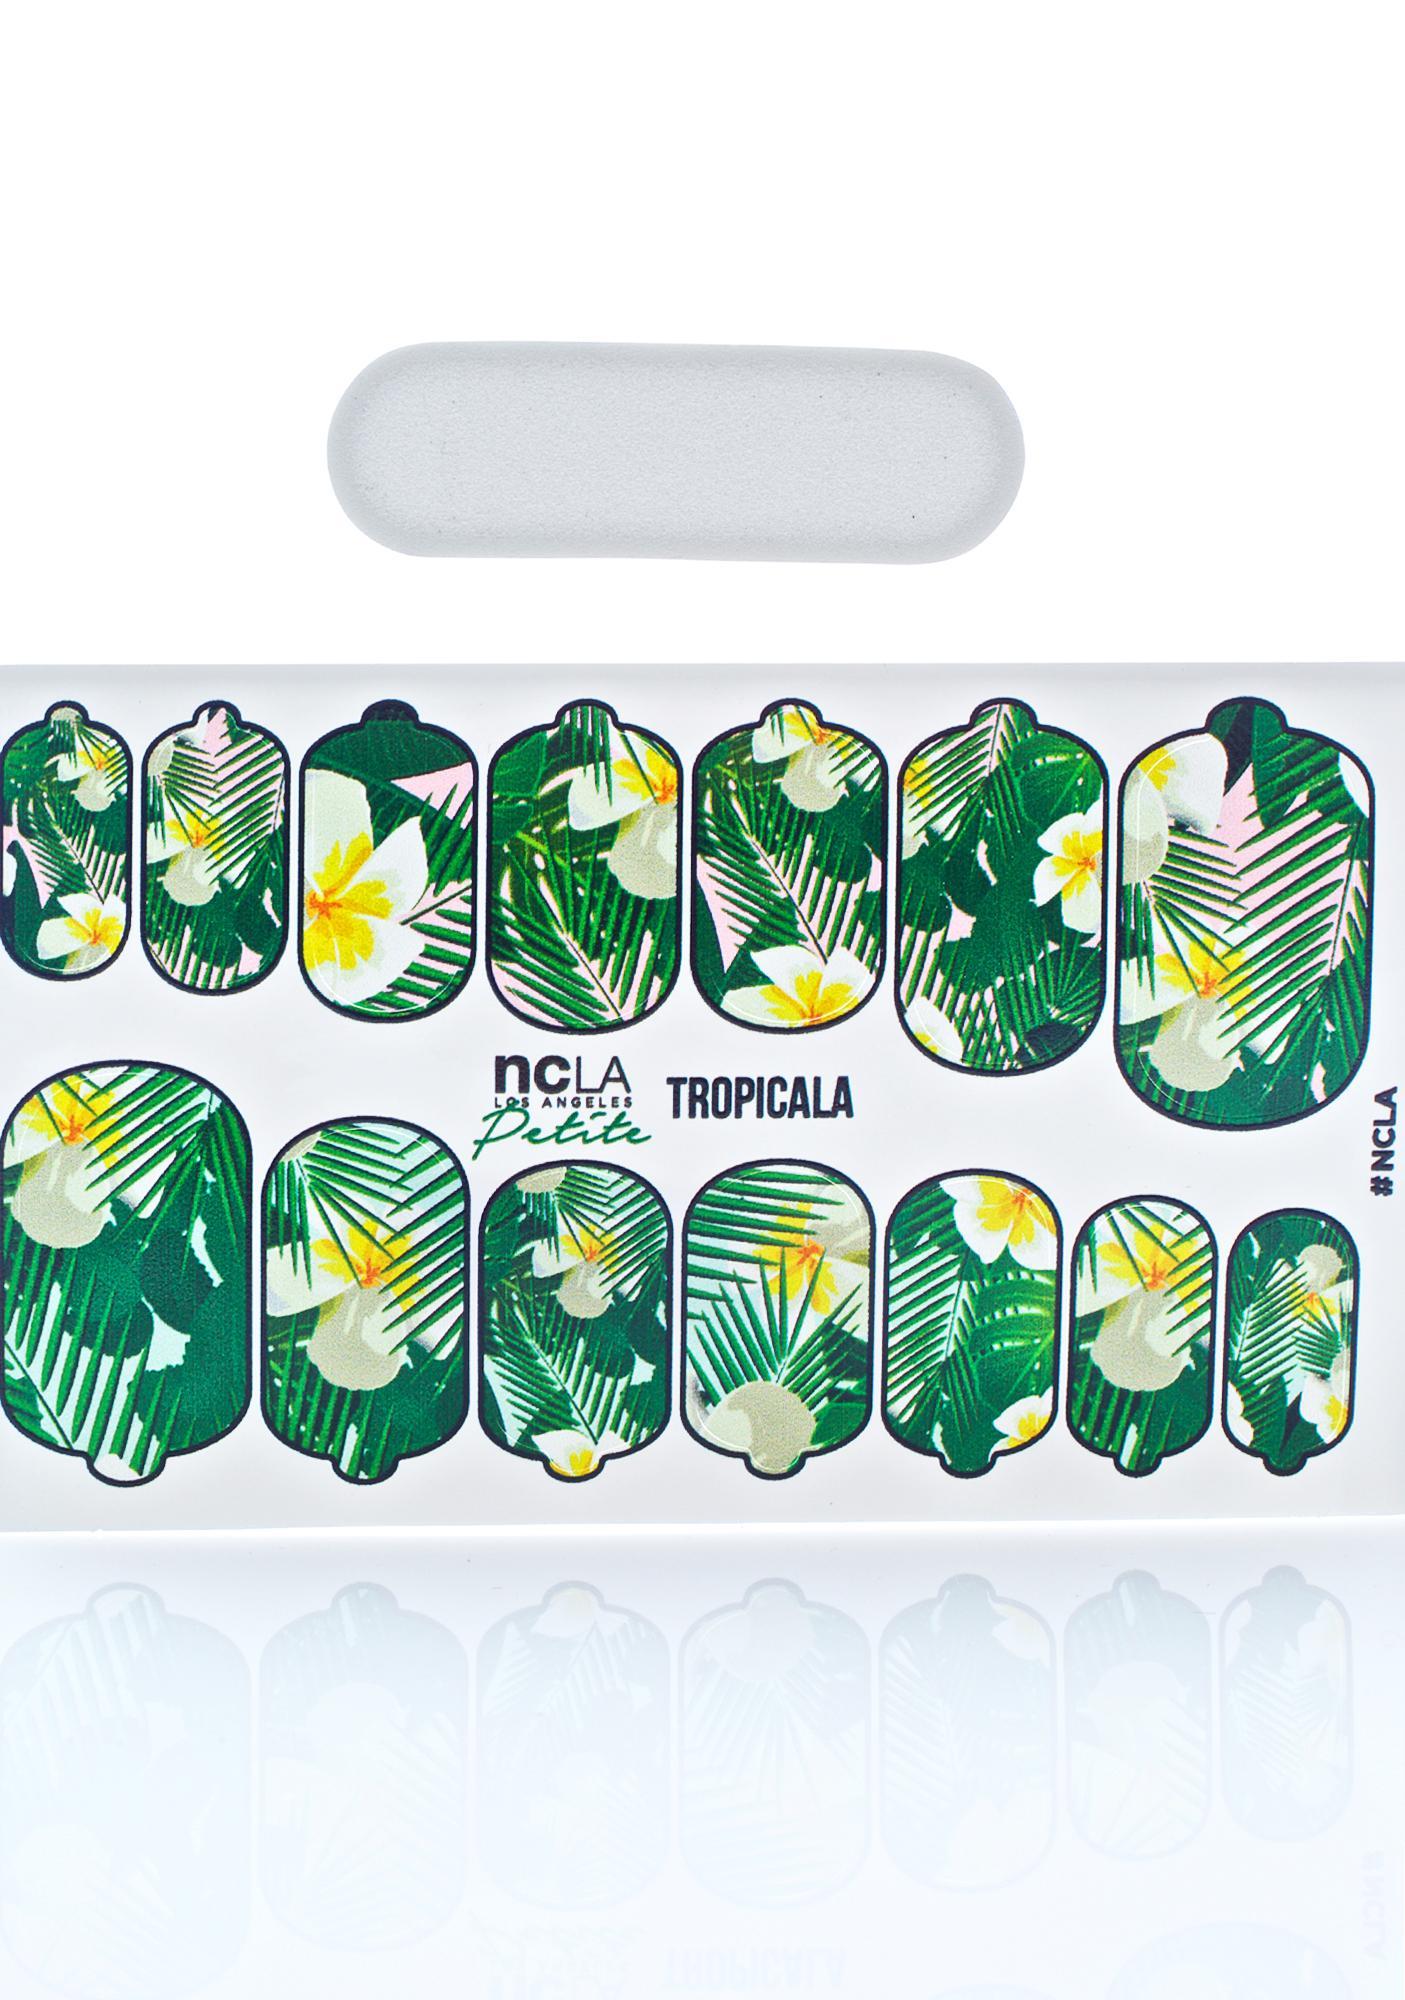 NCLA Tropicala Petite Nail Wraps